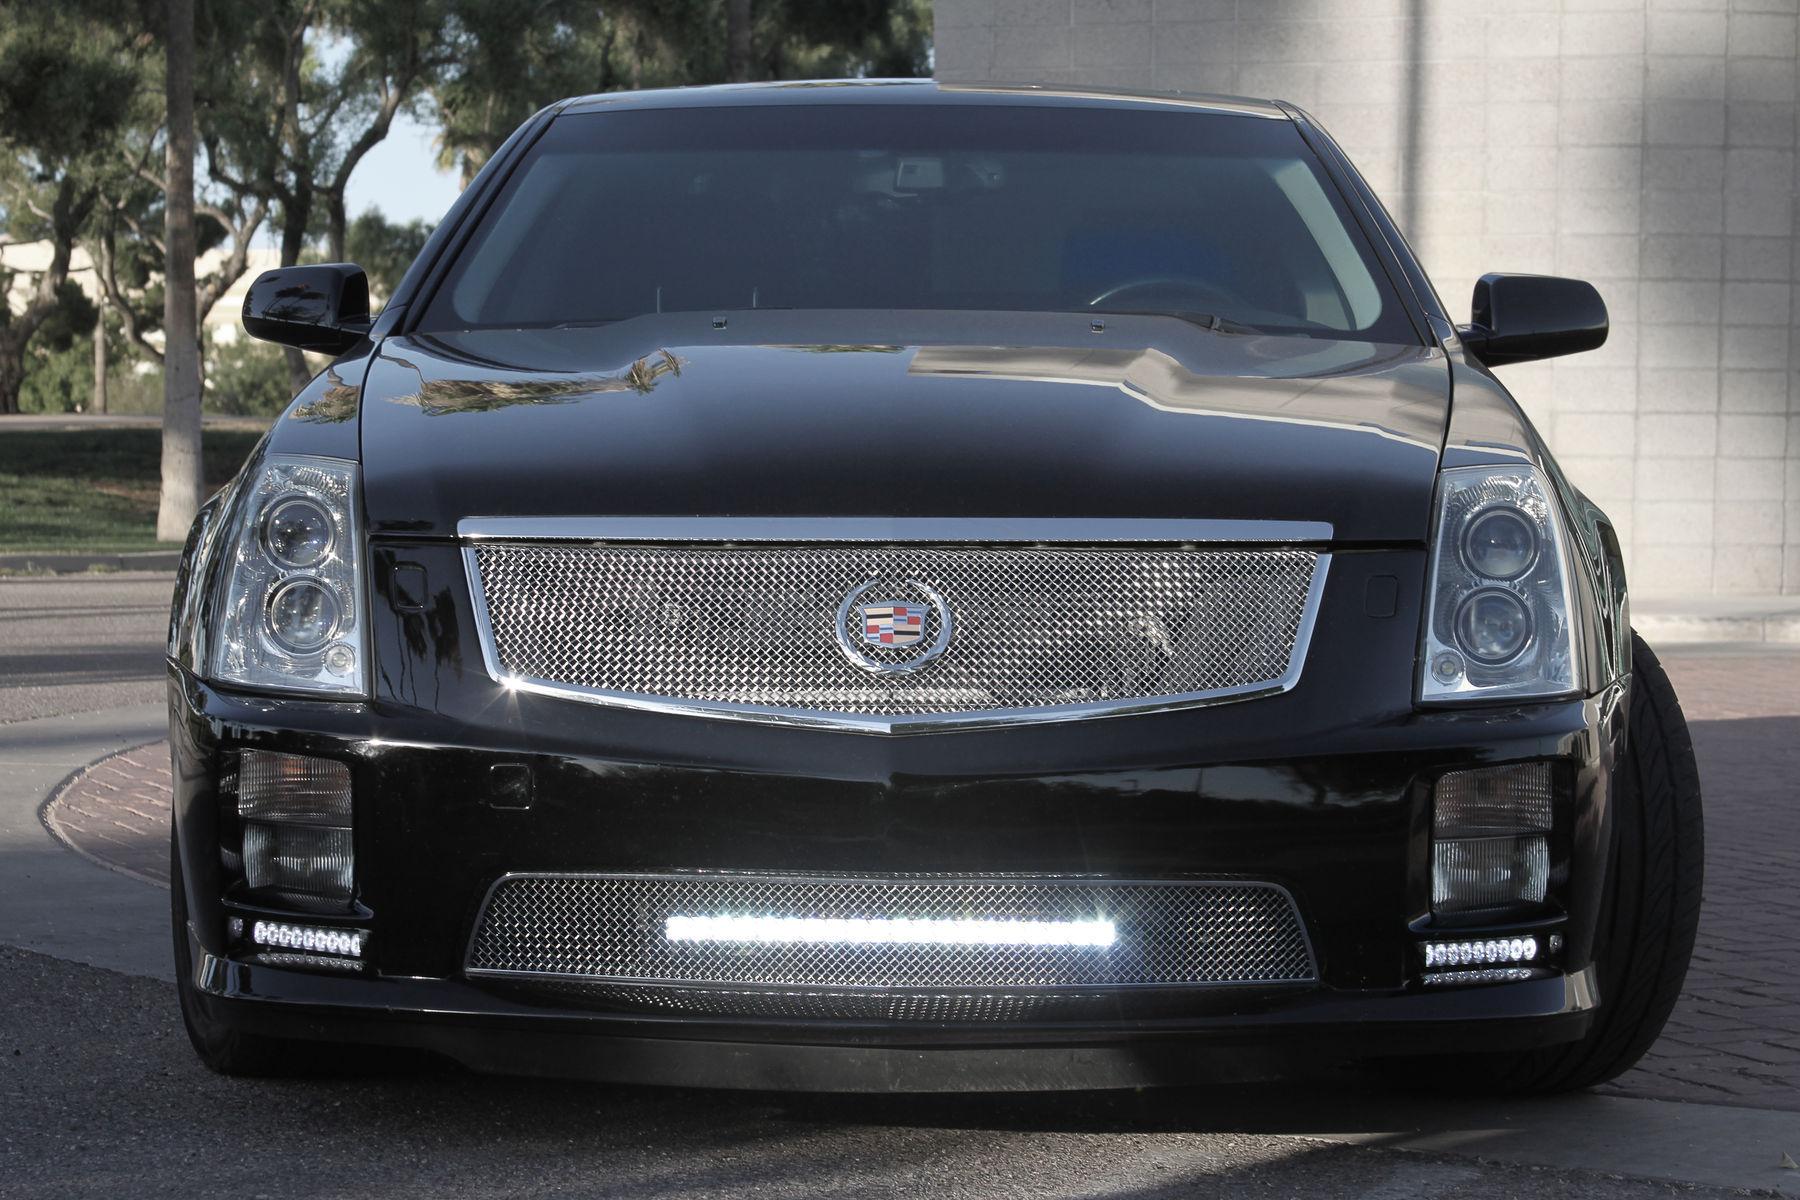 Cadillac  | Sleek Cadillac CTS with Sr-Series lights